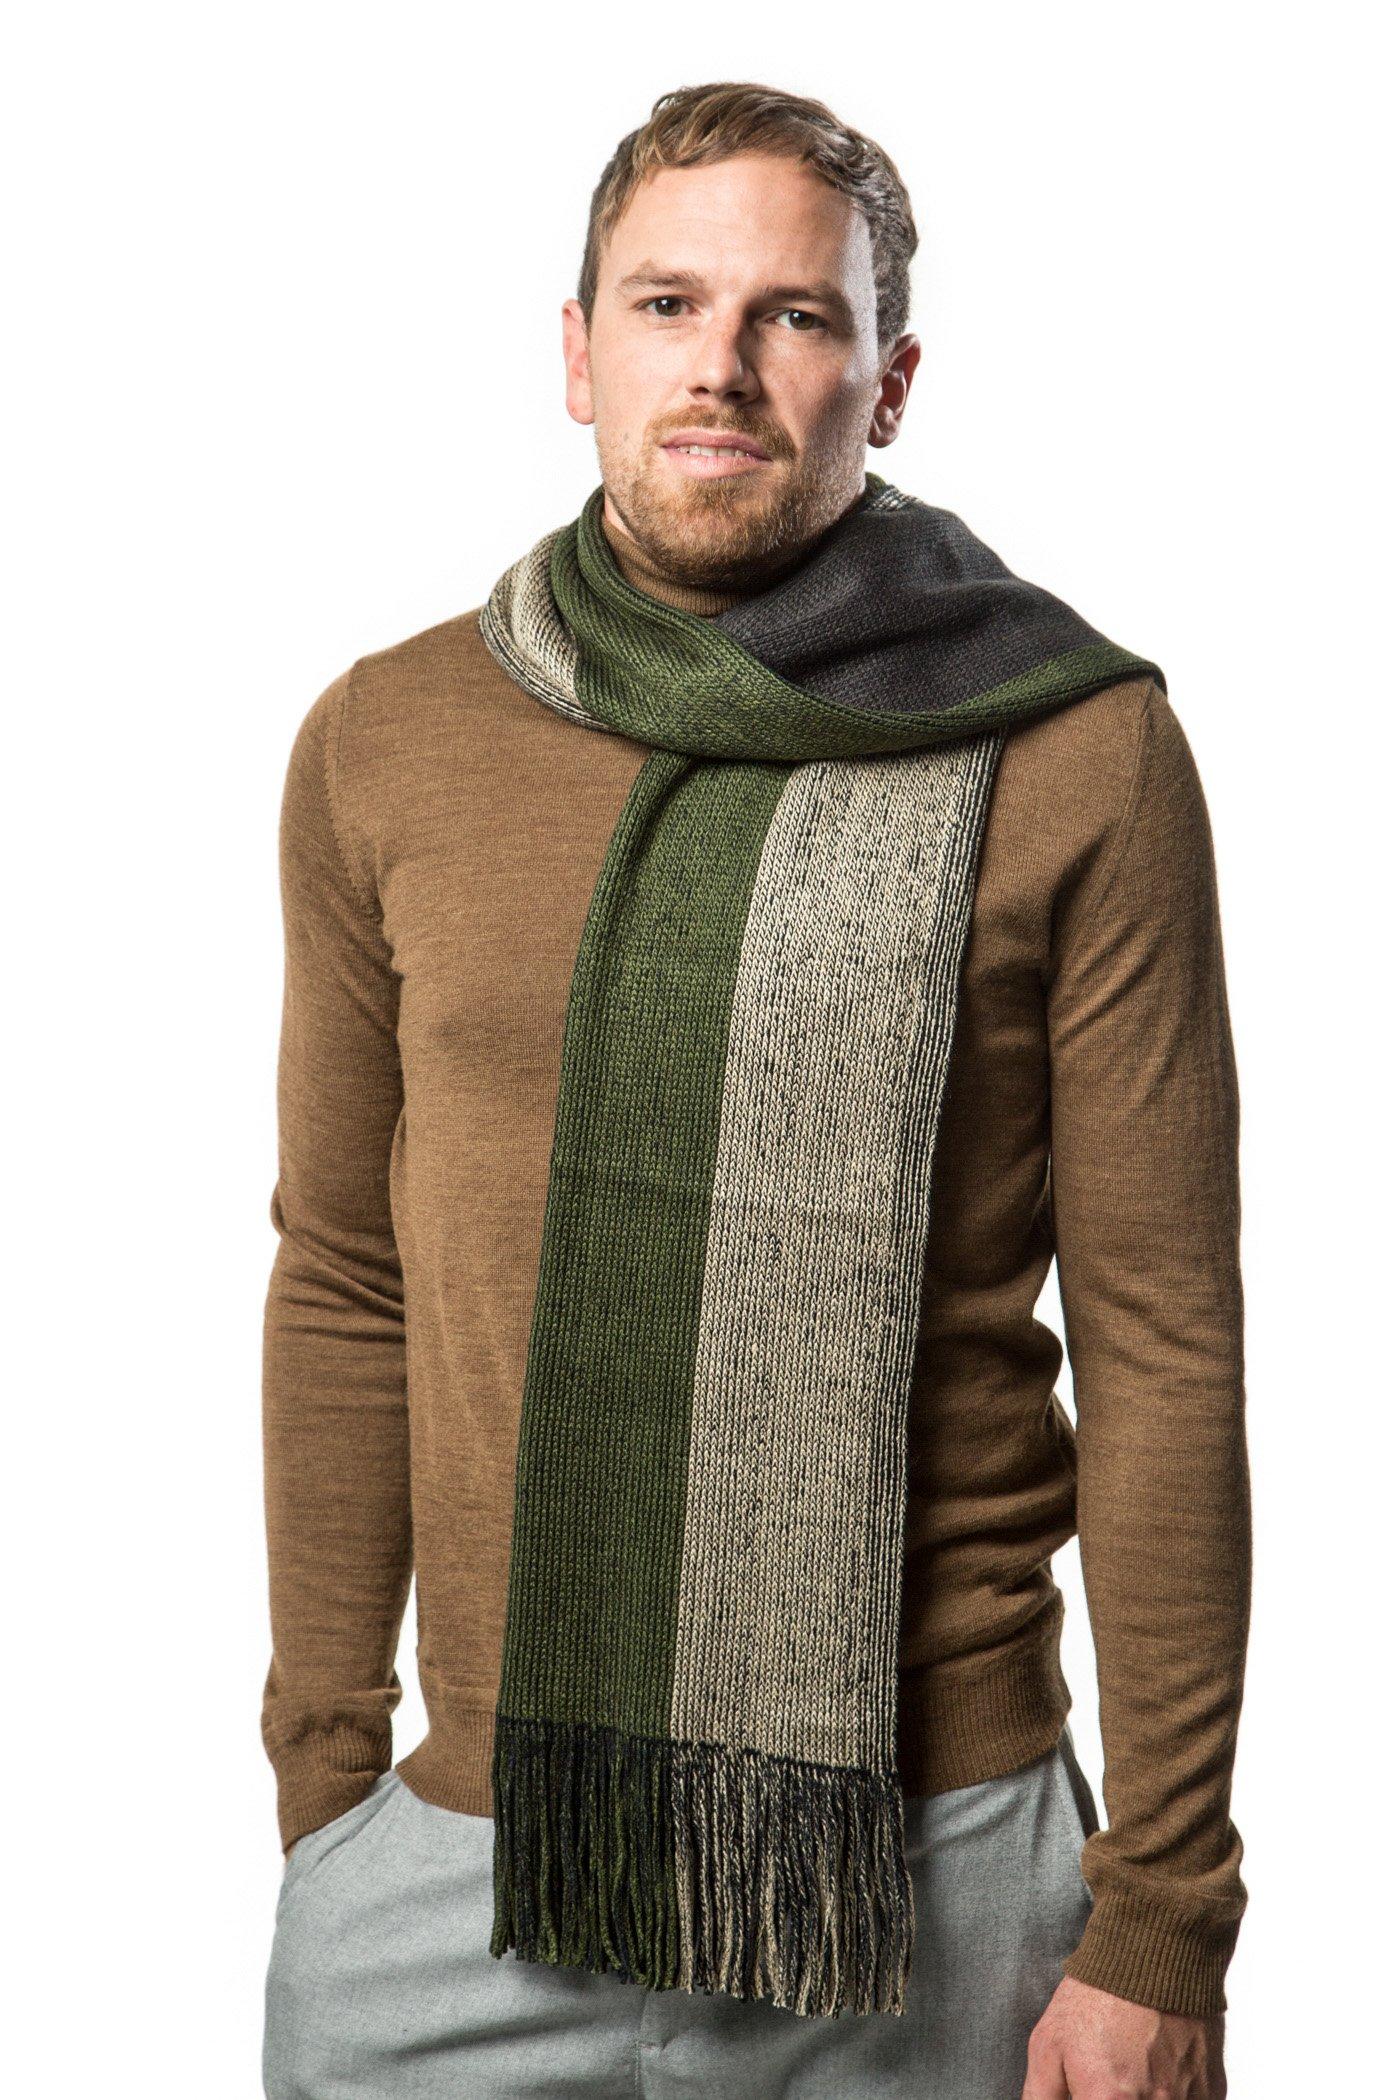 Winter Knit Scarf for men, Fashion Stripe Scarve in an elegant gift box - Multi Green